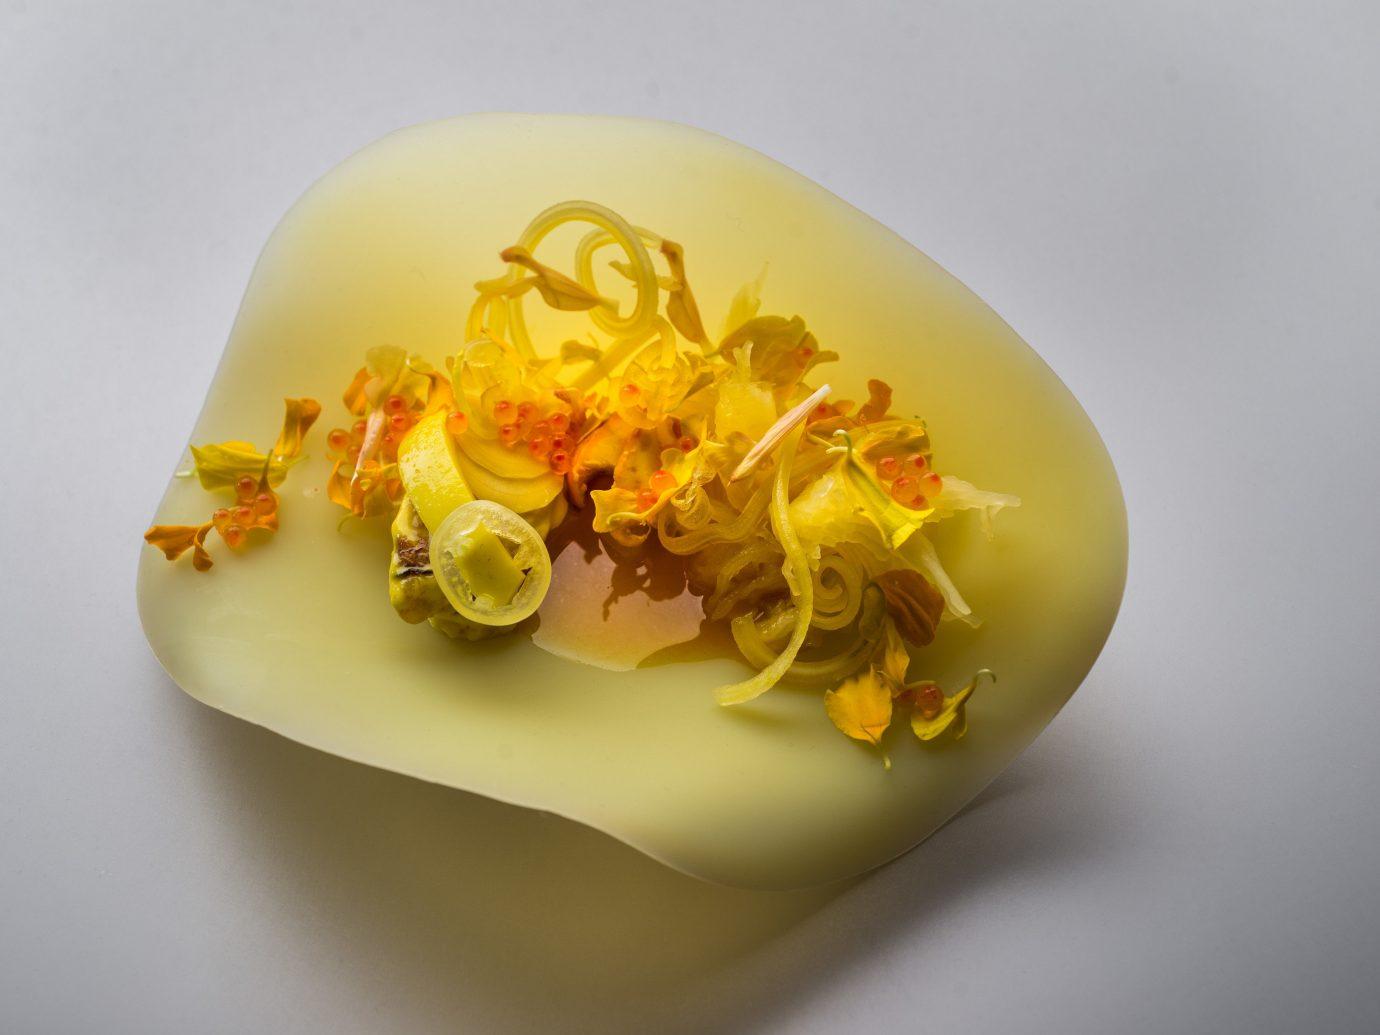 Trip Ideas food yellow plate jewellery flower egg fashion accessory plant petal leaf lighting macro photography amber produce gemstone meal